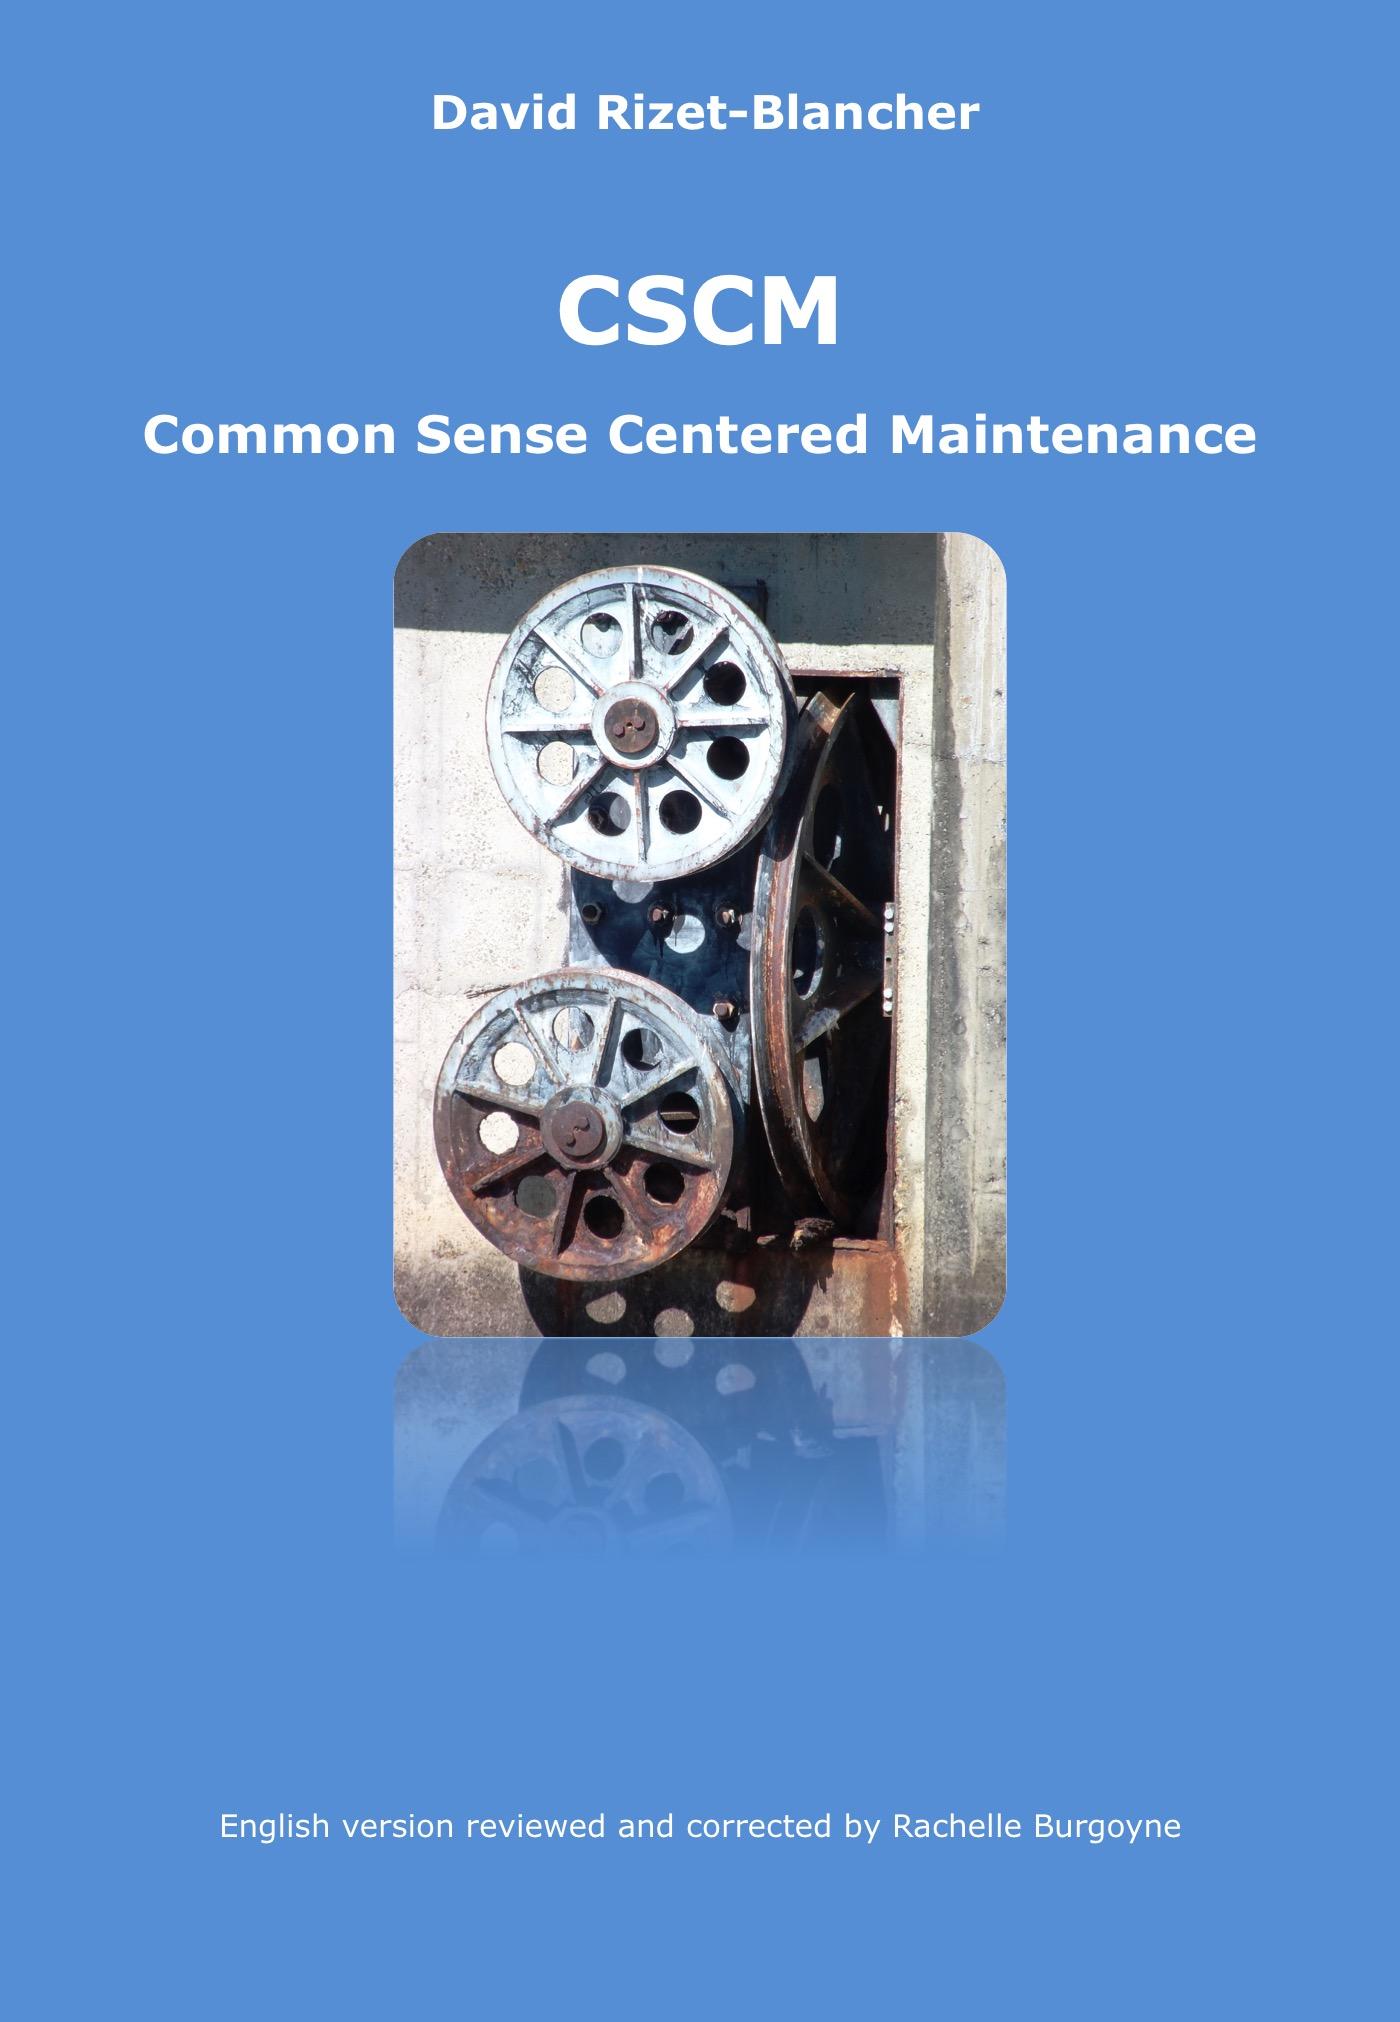 CSCM - Common Sense Centered Maintenance